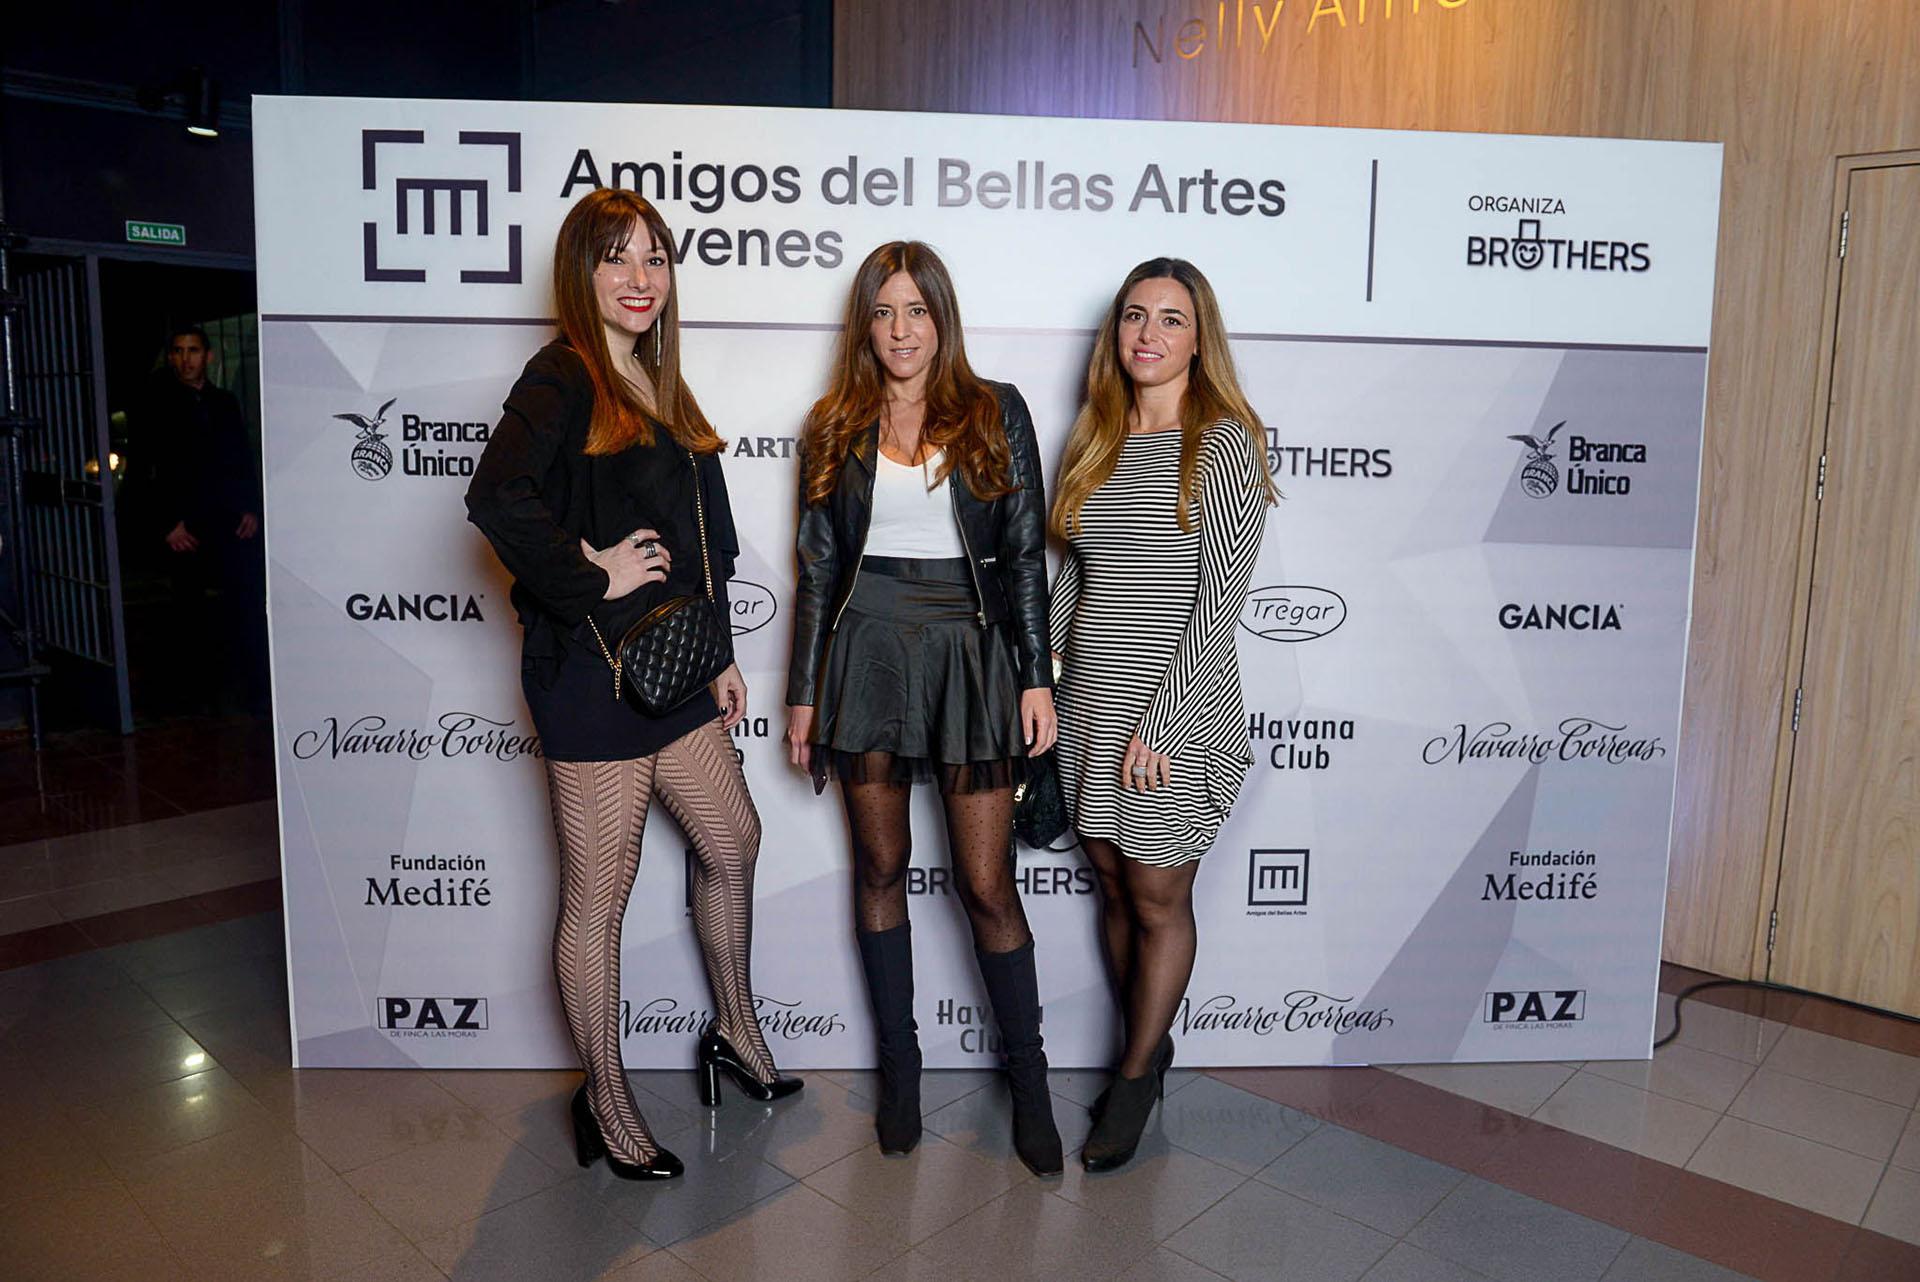 Luisina Lozada, Manuela Rattazzi y Marian Sarian